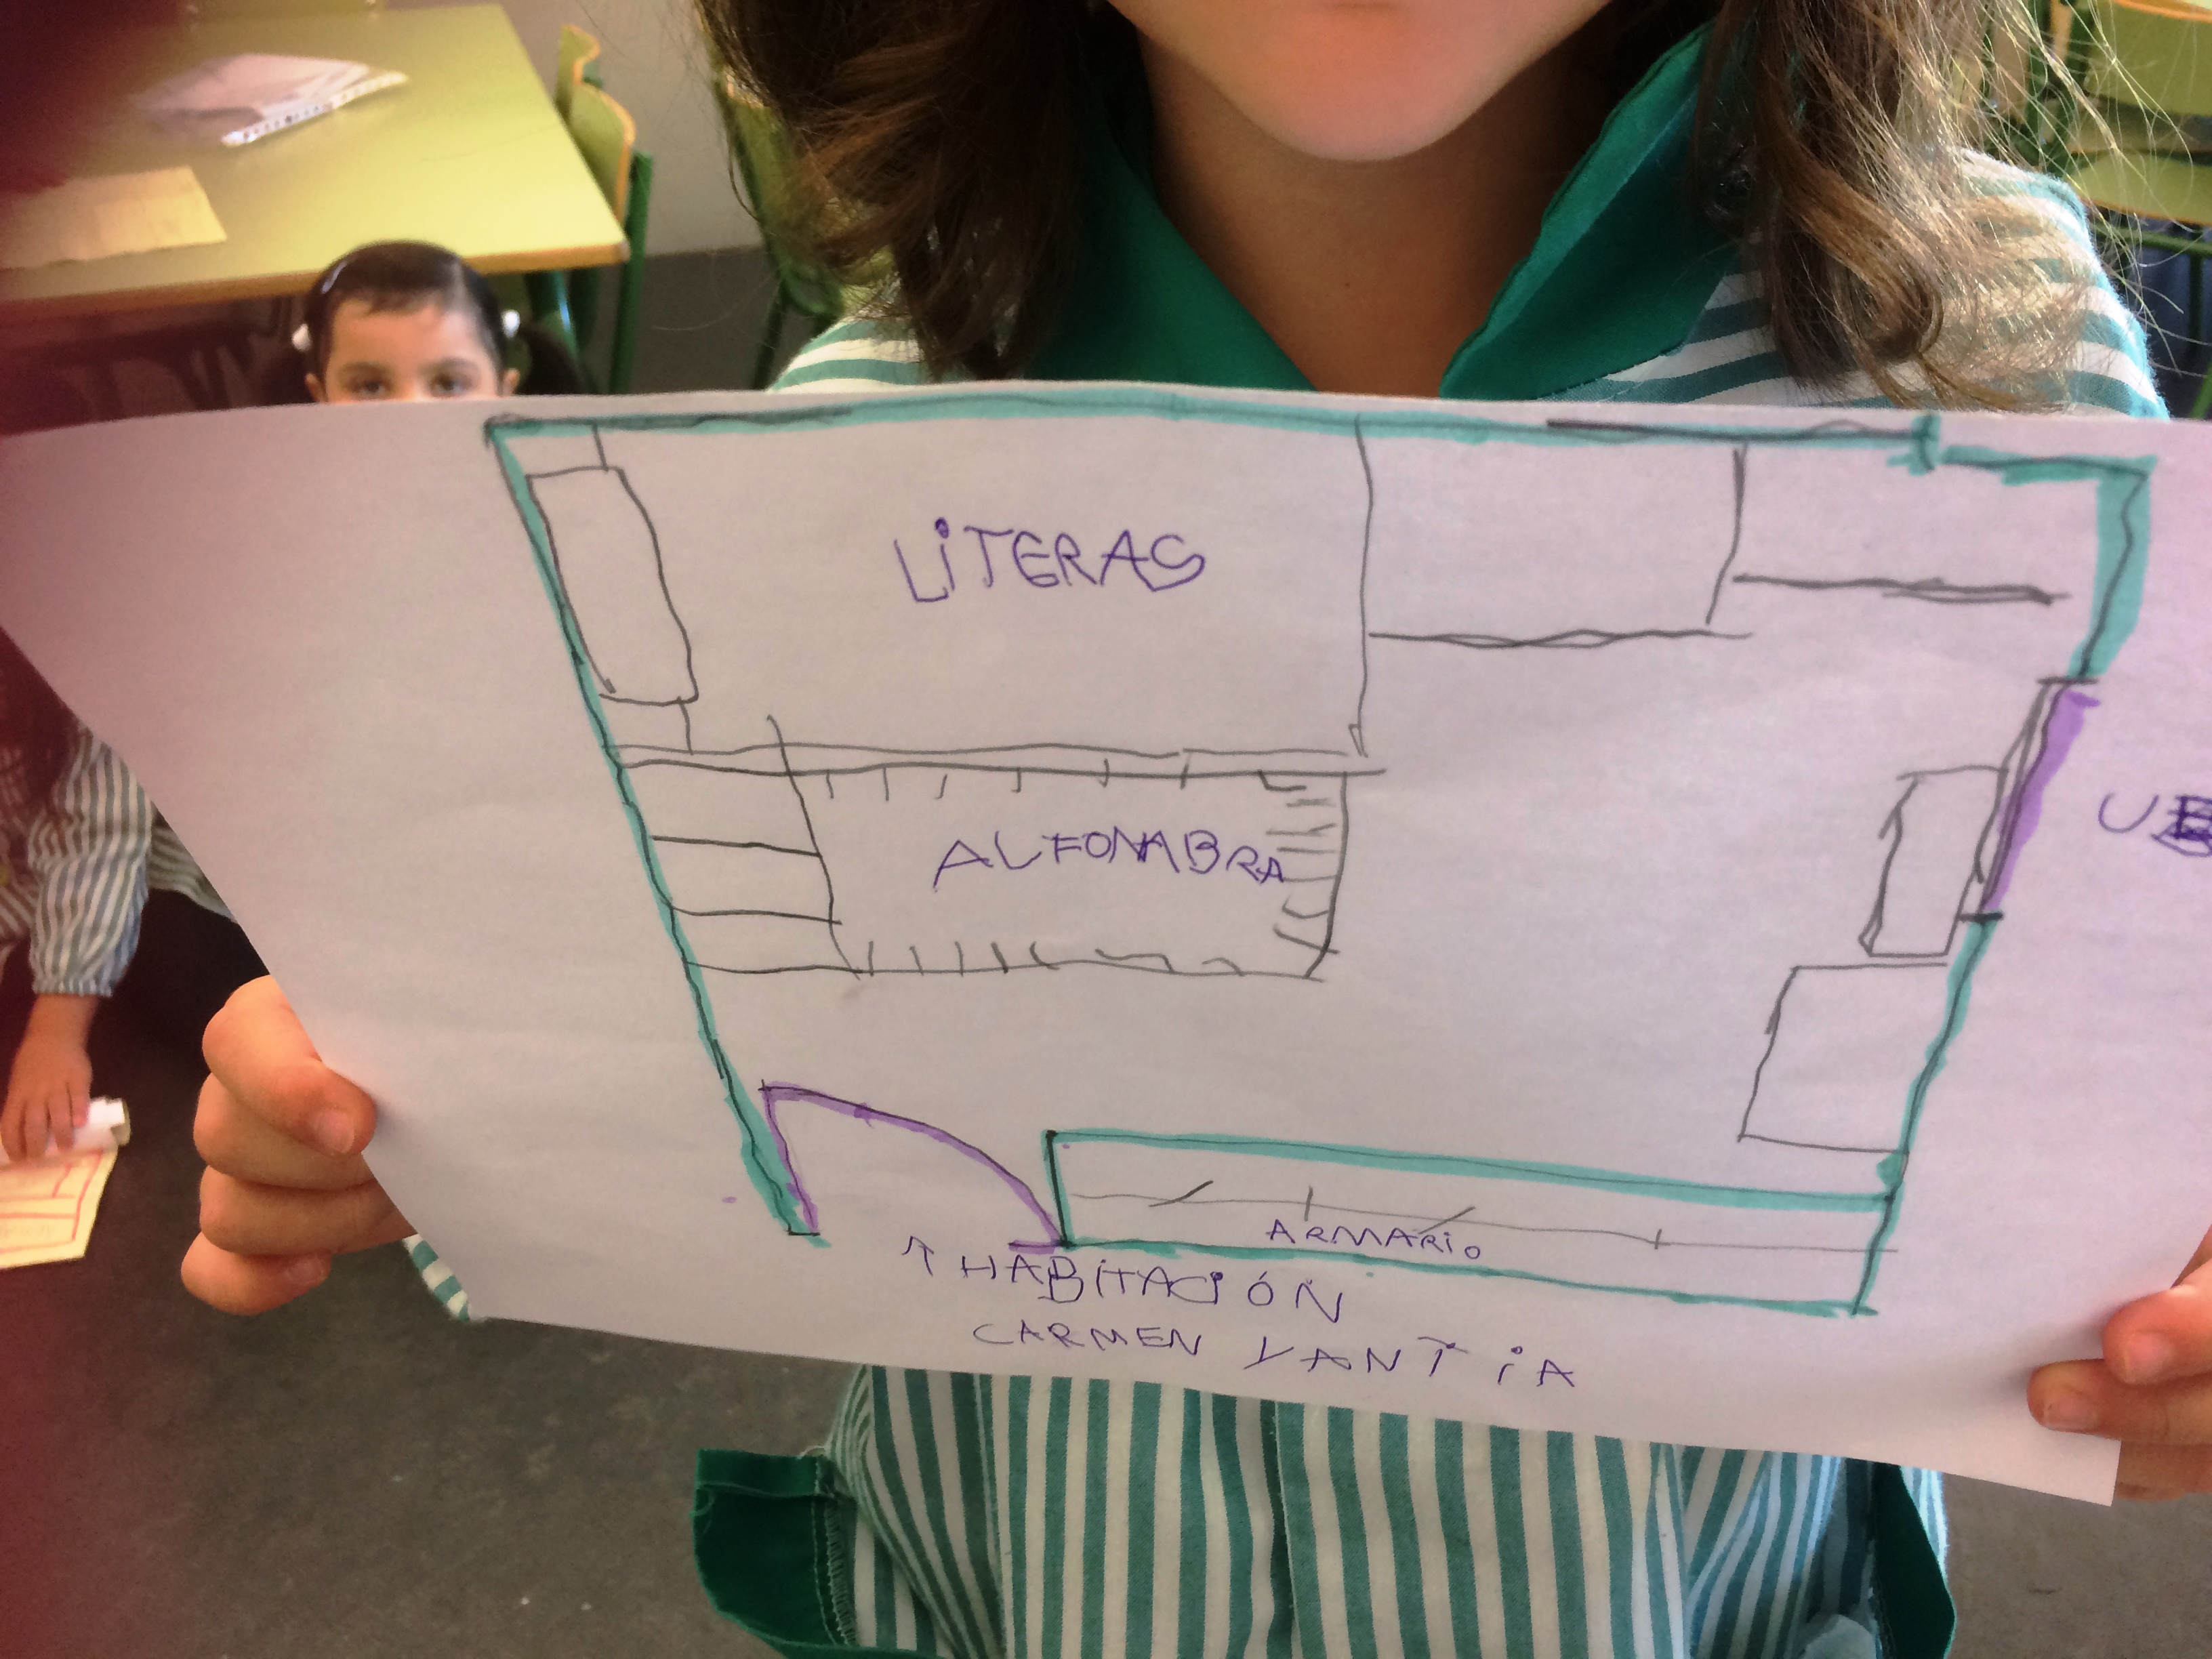 Planos a representaci n do espazo innovarte educaci n for Plano aula educacion infantil